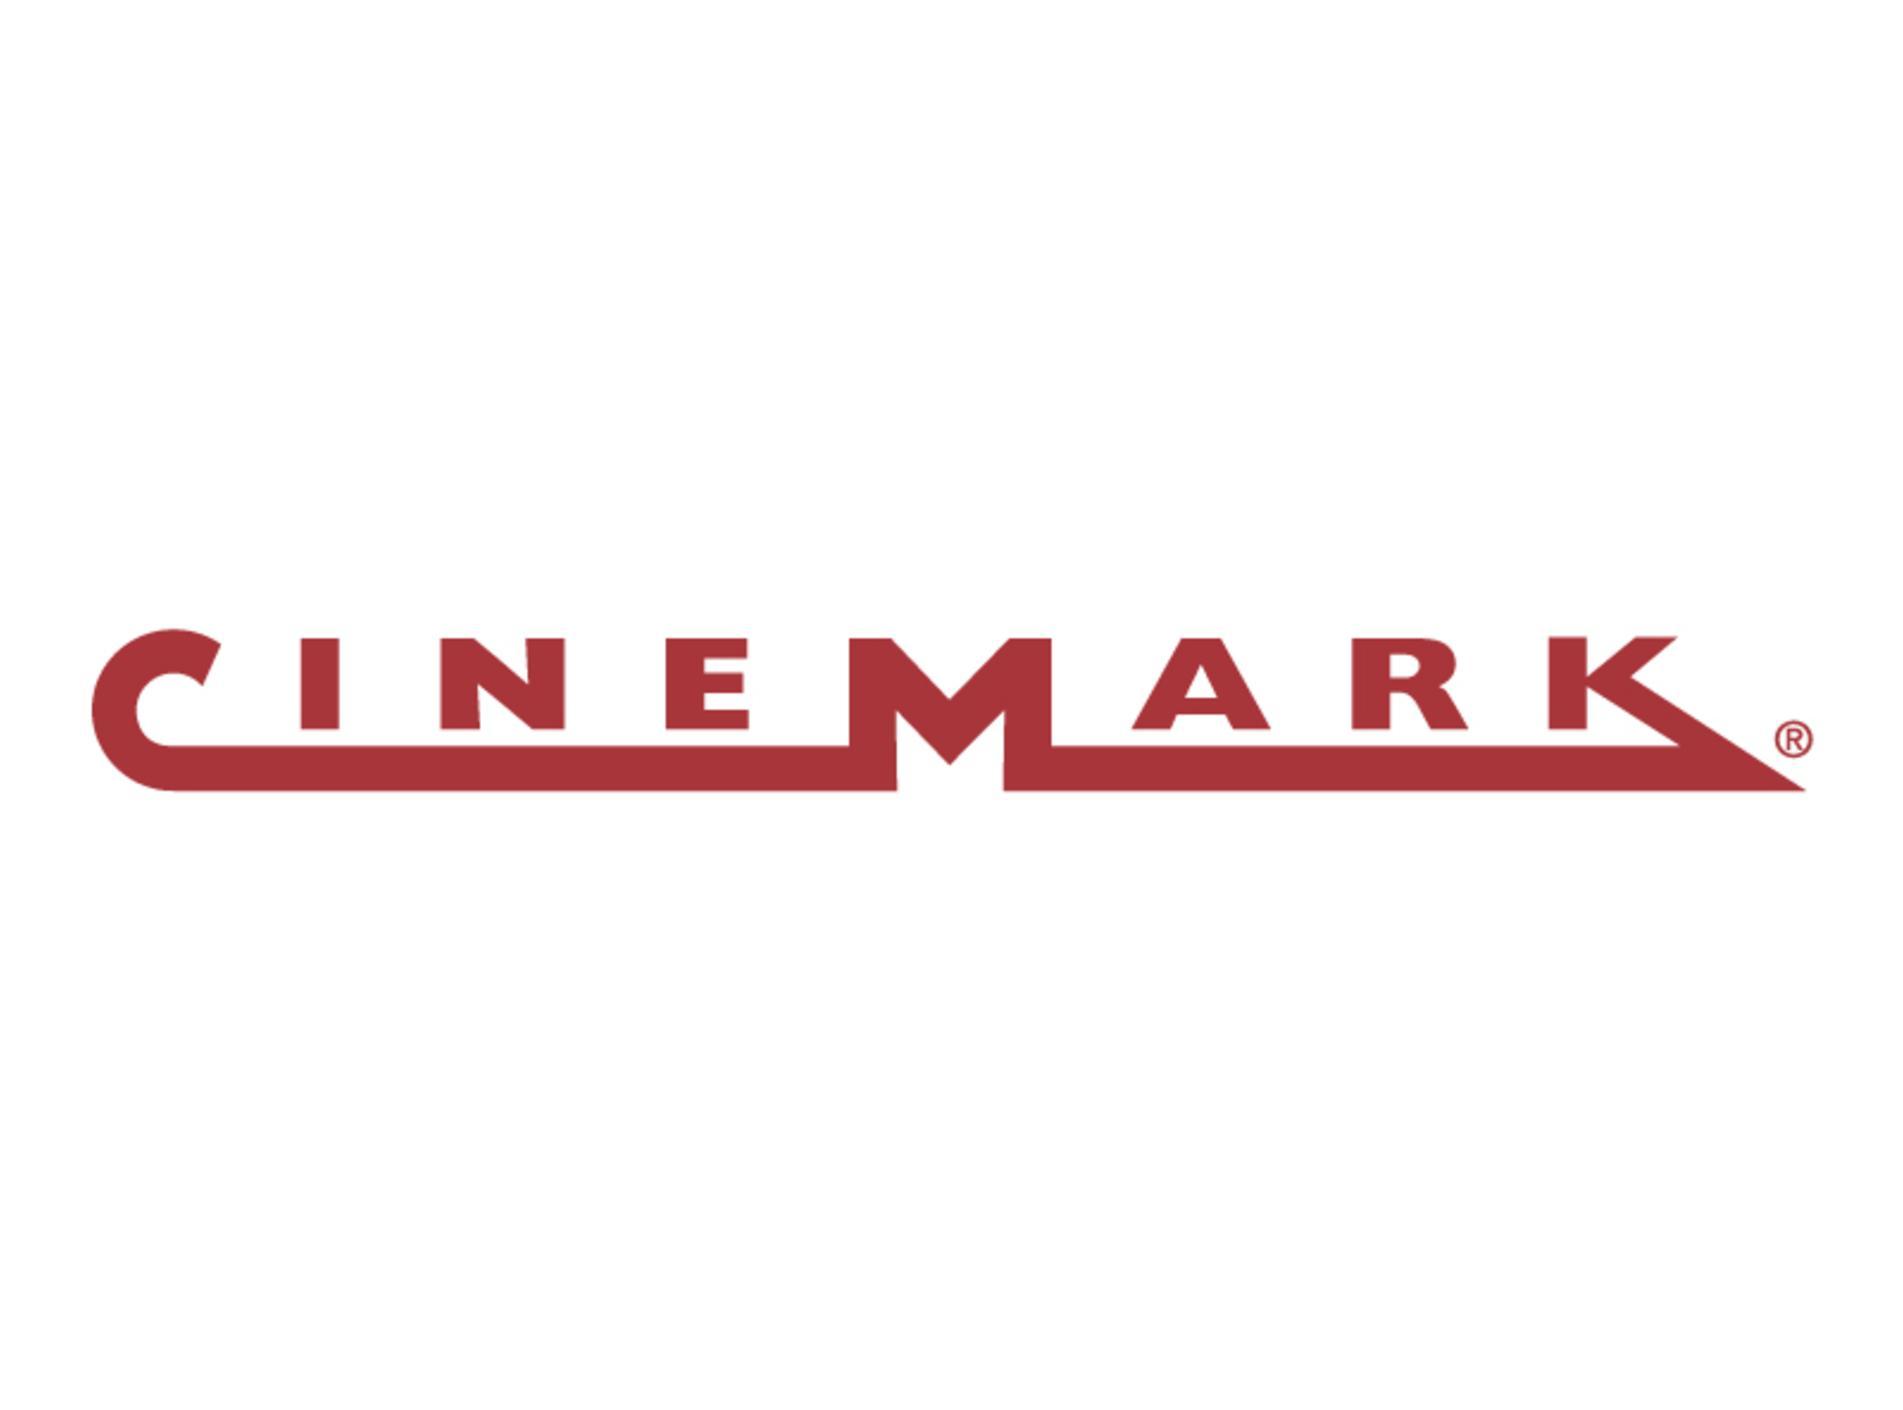 Cinemark Movies 18 and XD